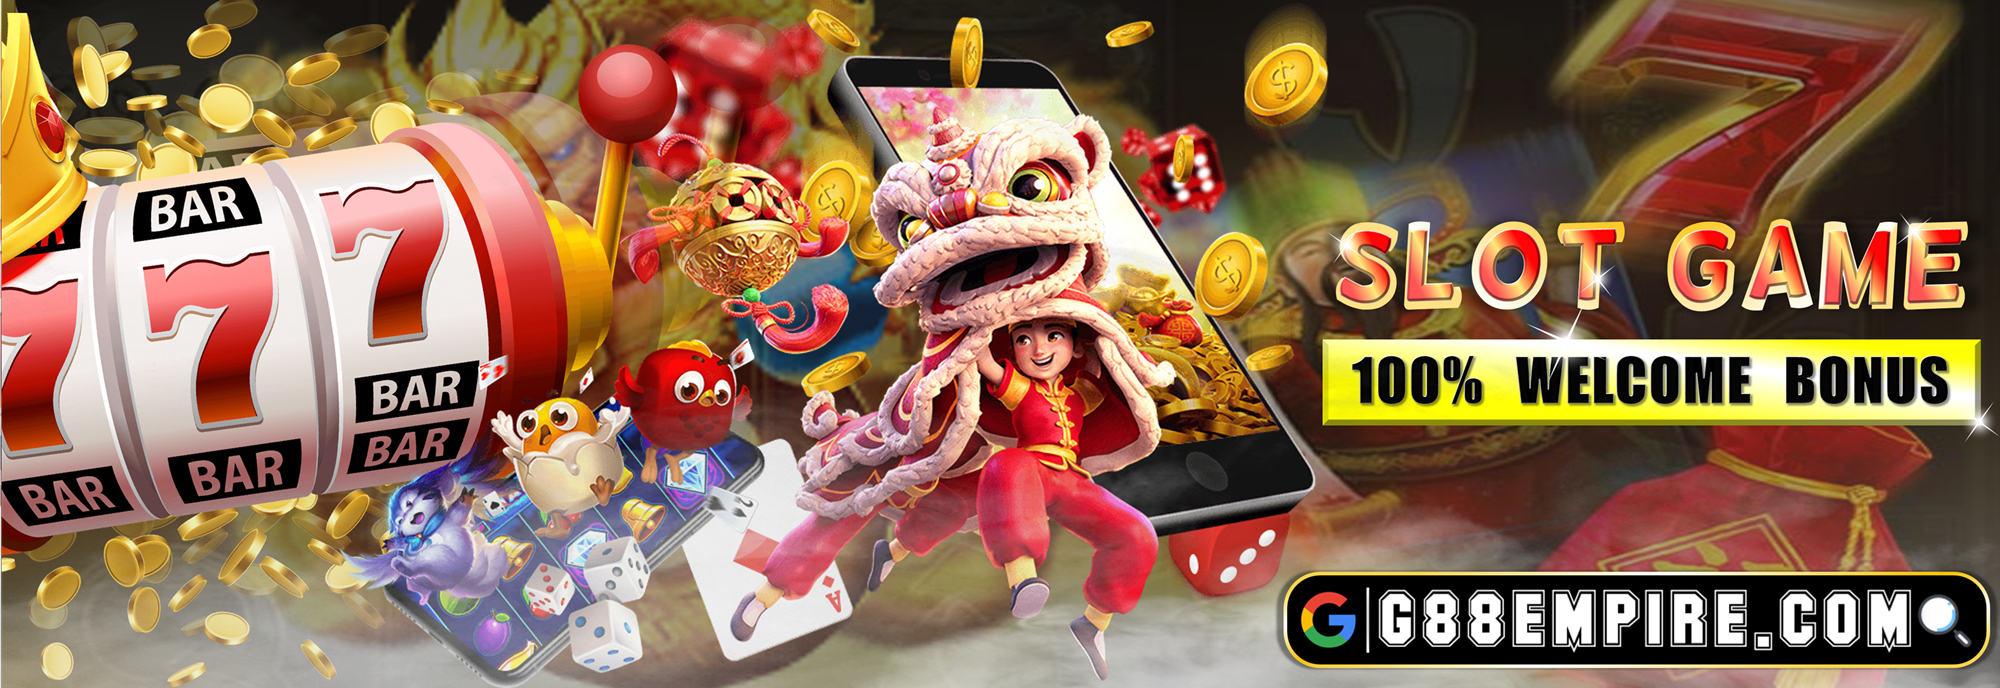 Slot Malaysia and Singapore Trust Online Casino, Live Slot Online Casino Game Win Cuci Jackpot SCR888 SCR Ace333 Ace Leocity LPE Newtown Gw99 P2P Joker Pussy888 Pussy 918Kiss Kiss Live22 Mega Xe88 Joker G88Empire GrandEmpire